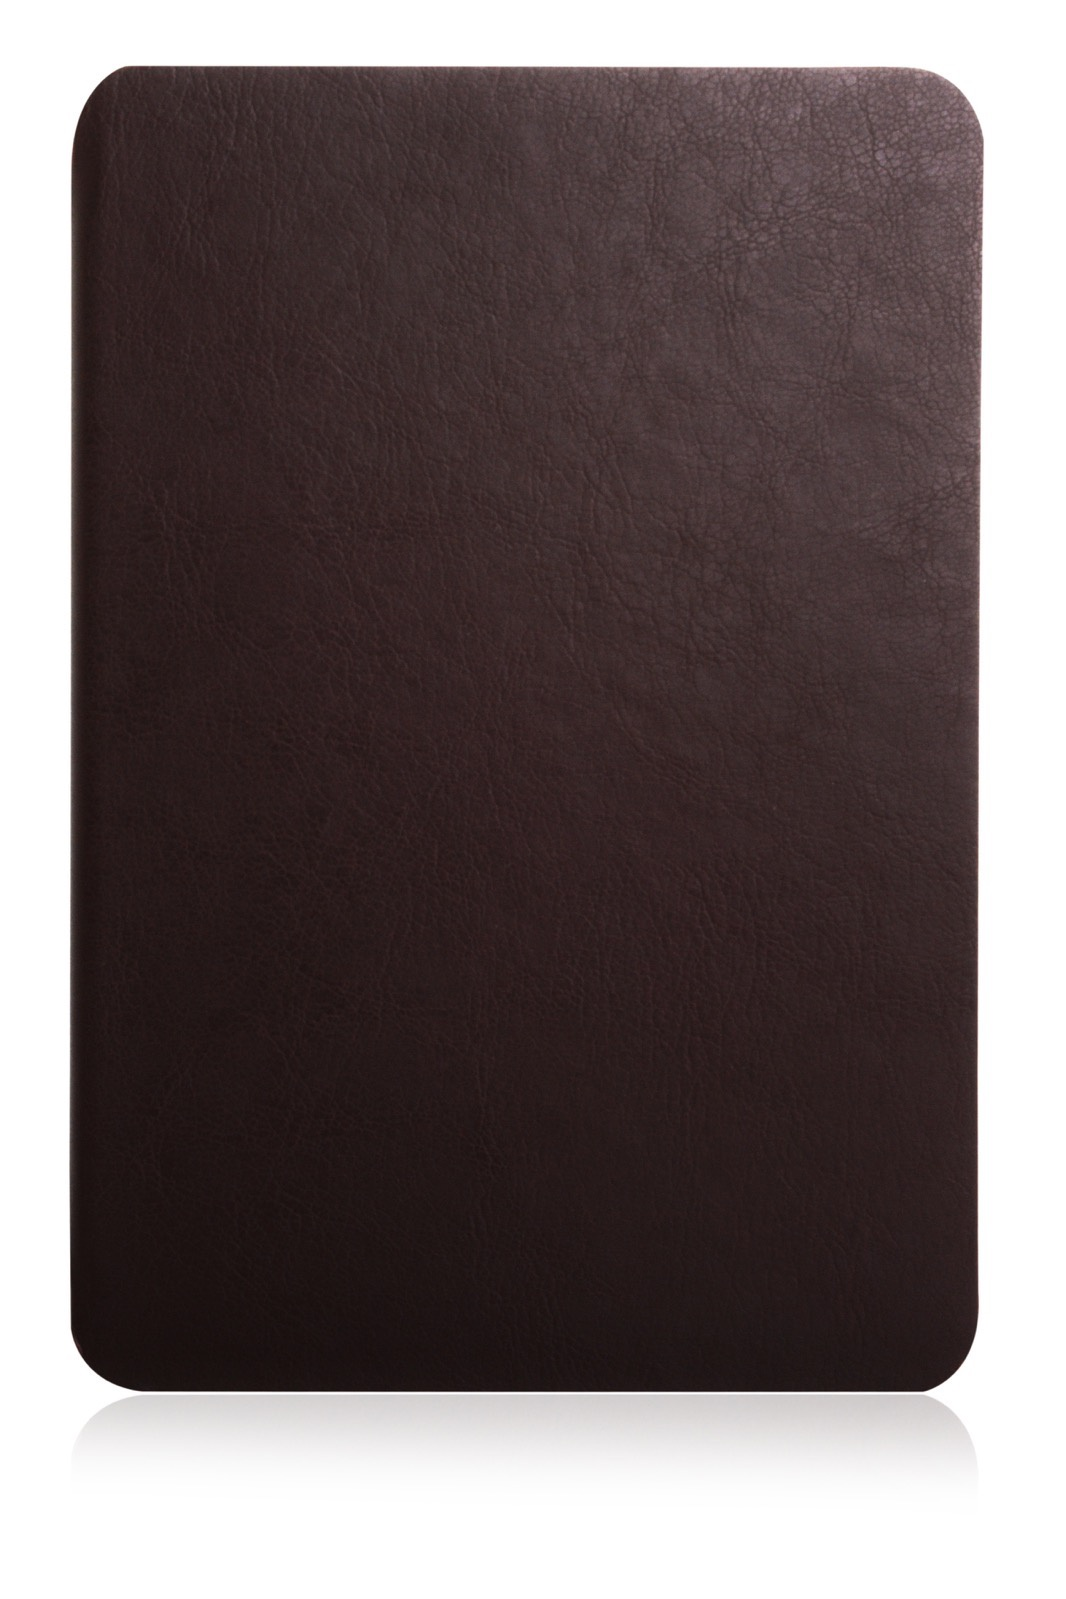 "Чехол для планшета iNeez Smart style книжка 410032 для iPad mini 7.9"", коричневый"